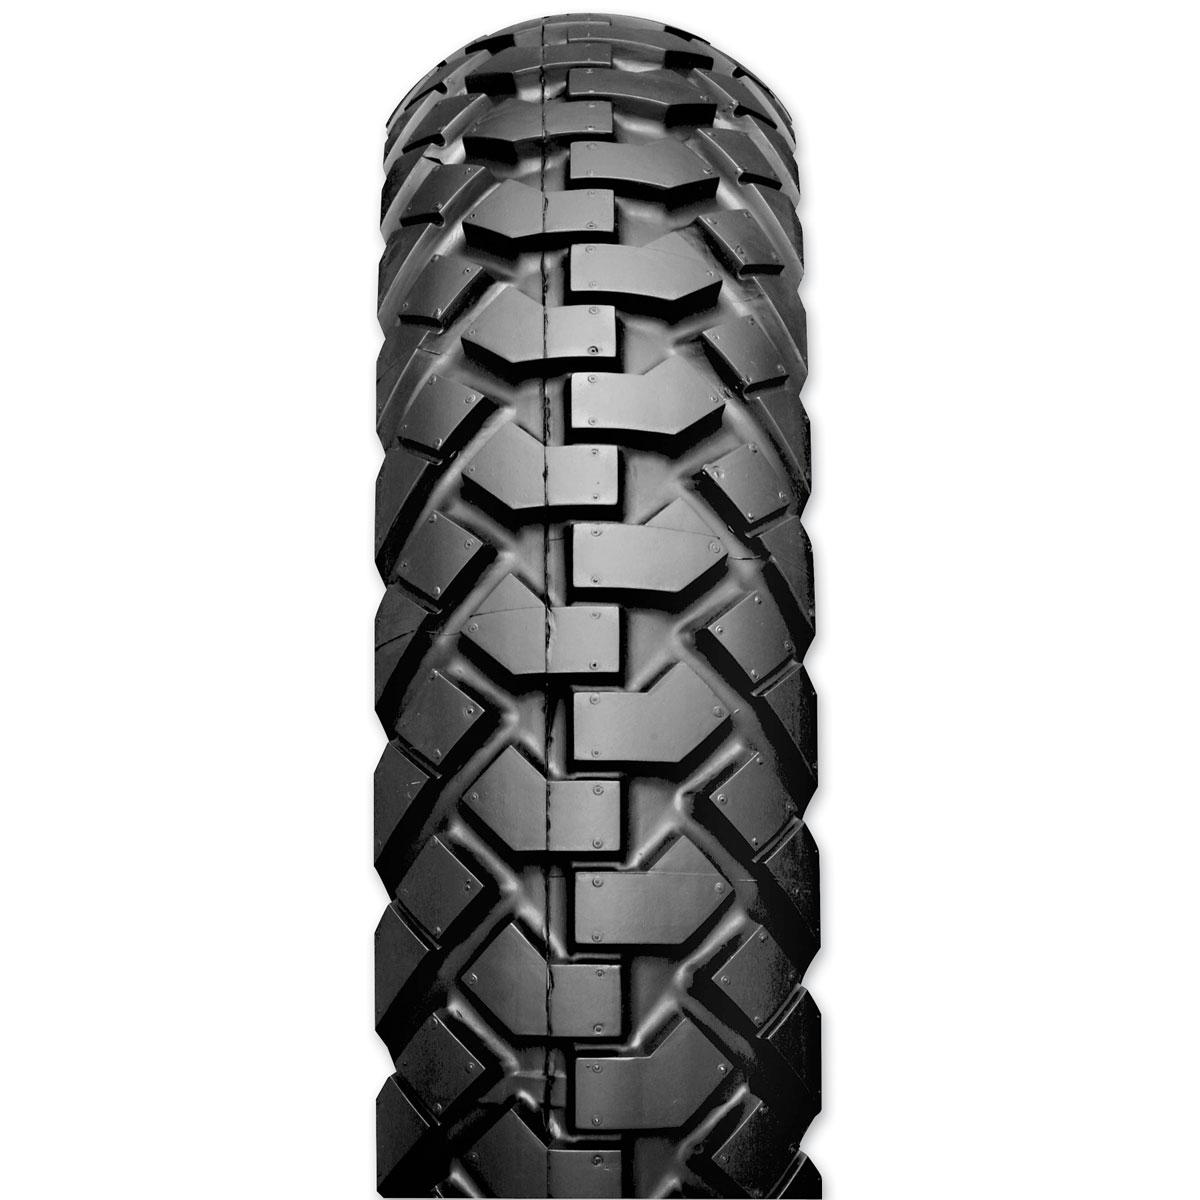 IRC GP110 4.10S18 Rear Tire